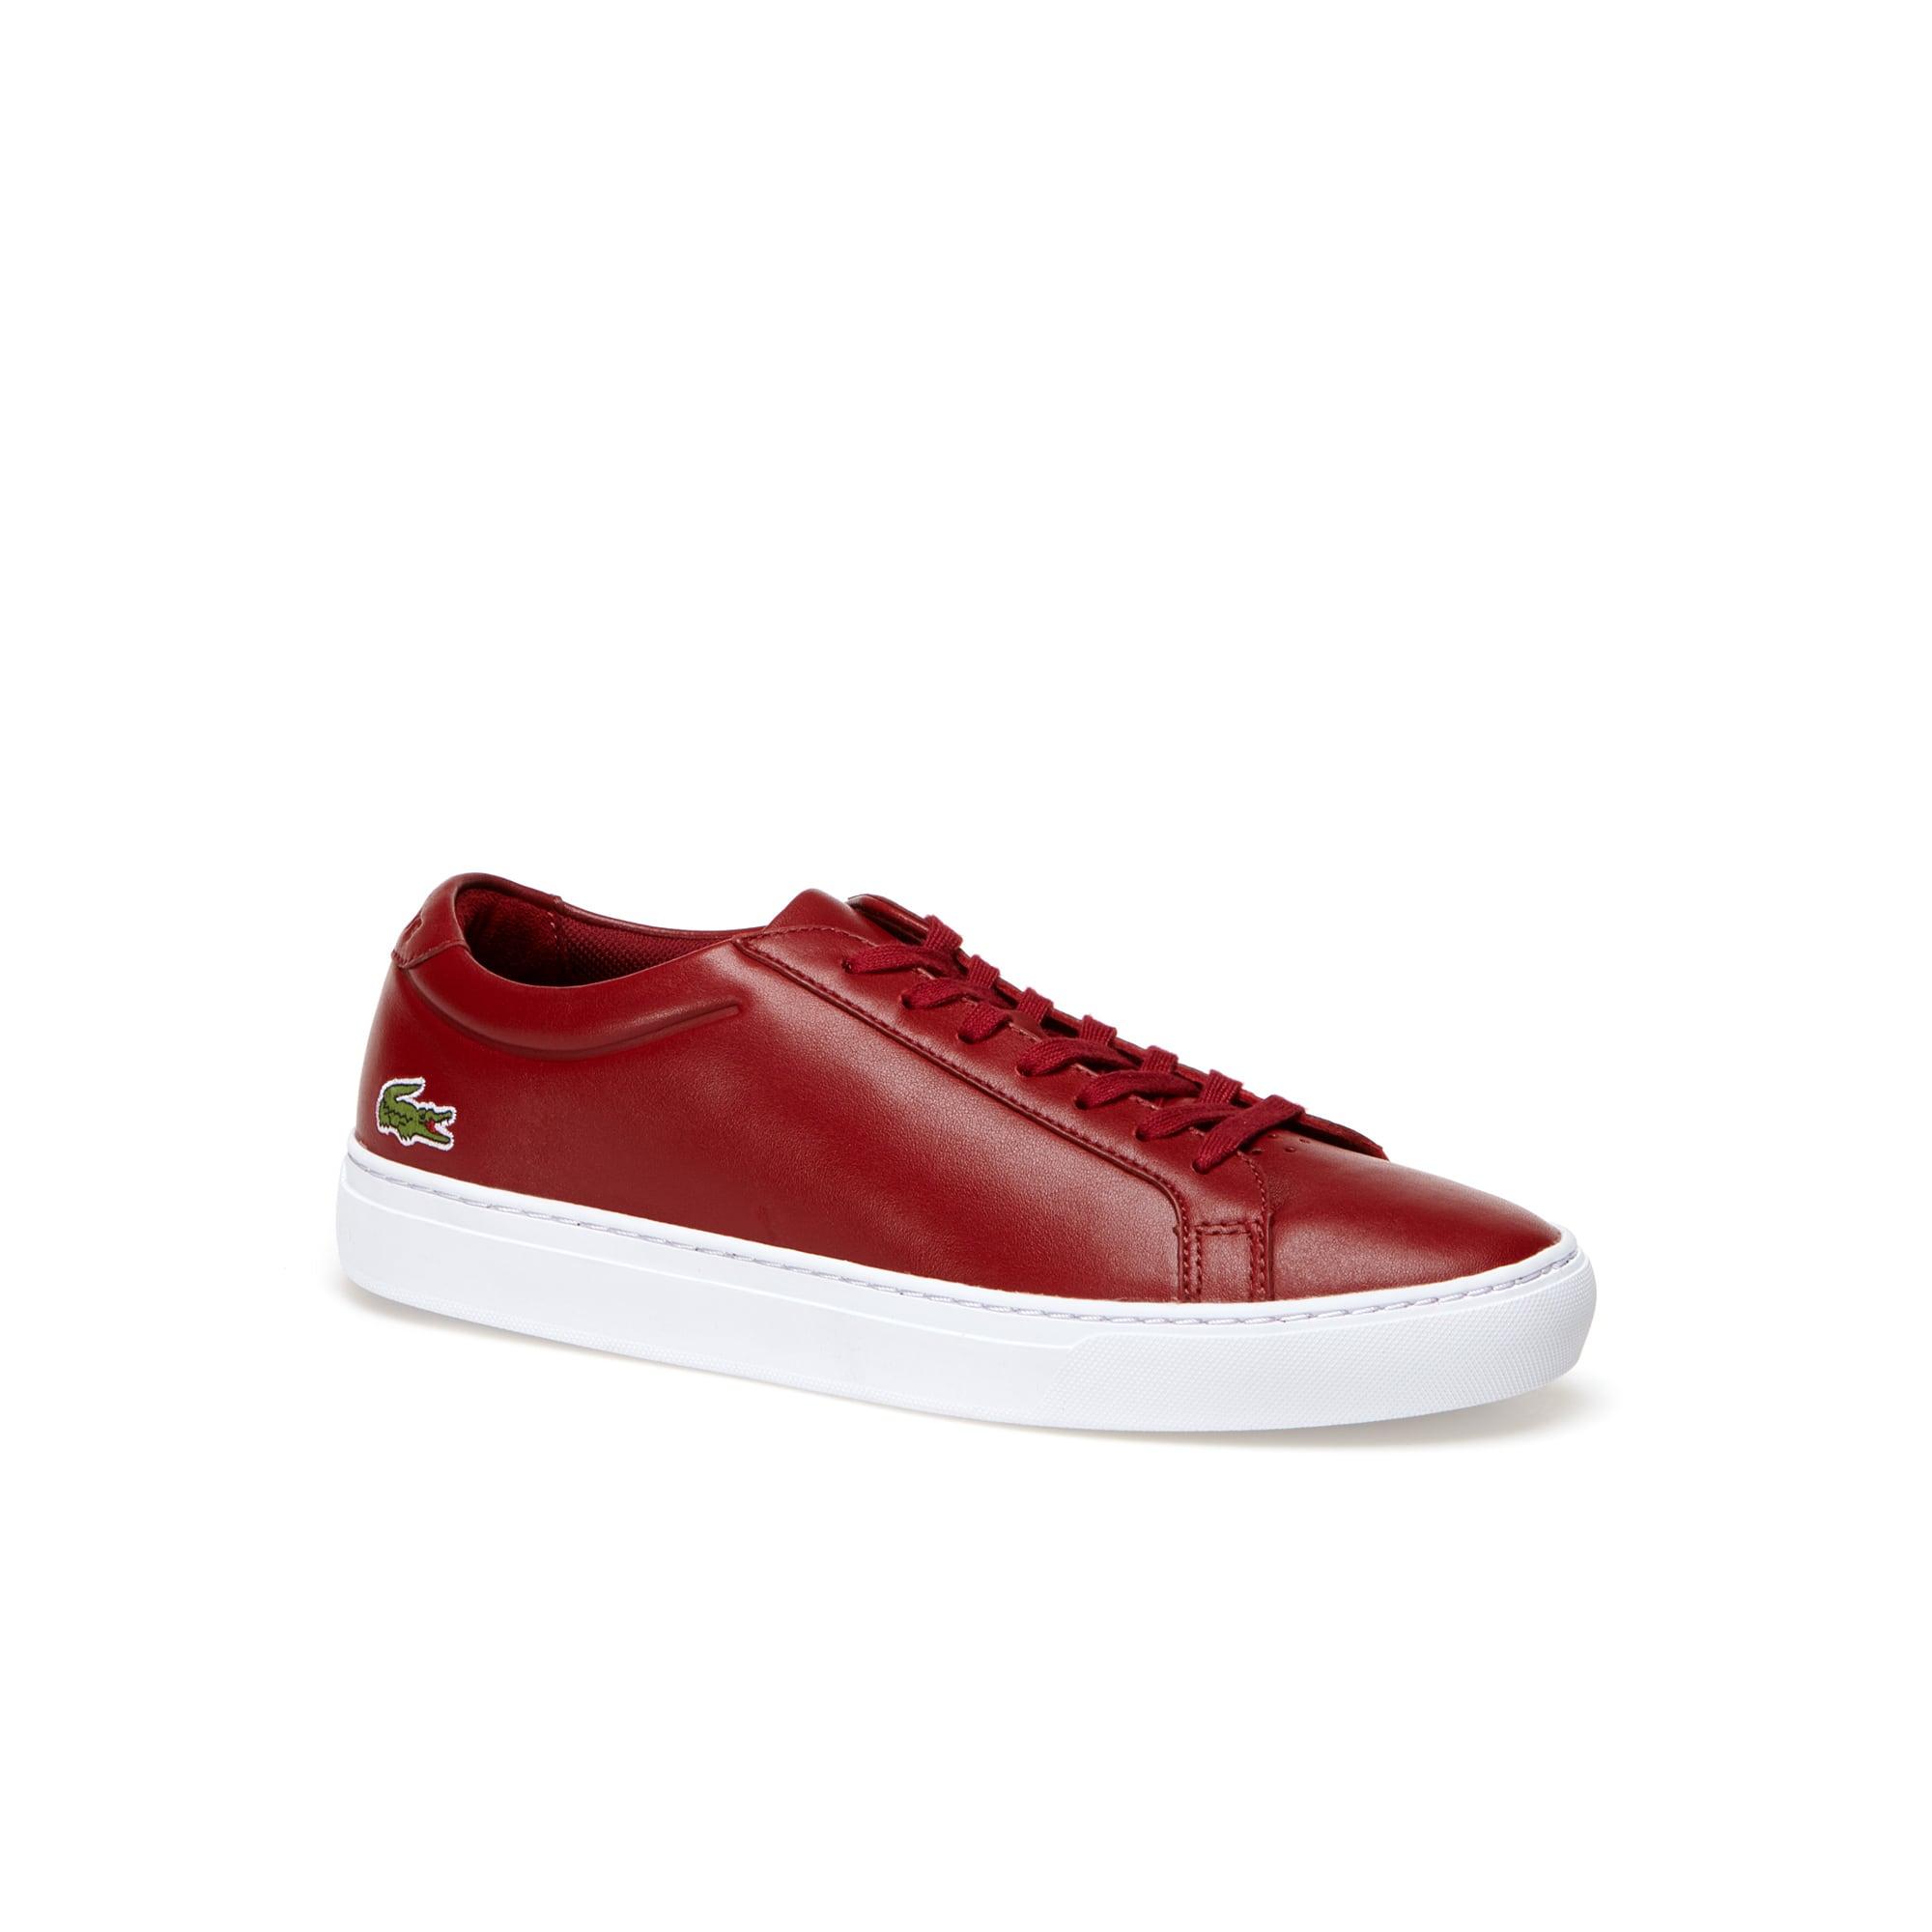 Der L.12.12. Schuh aus hochwertigem Leder